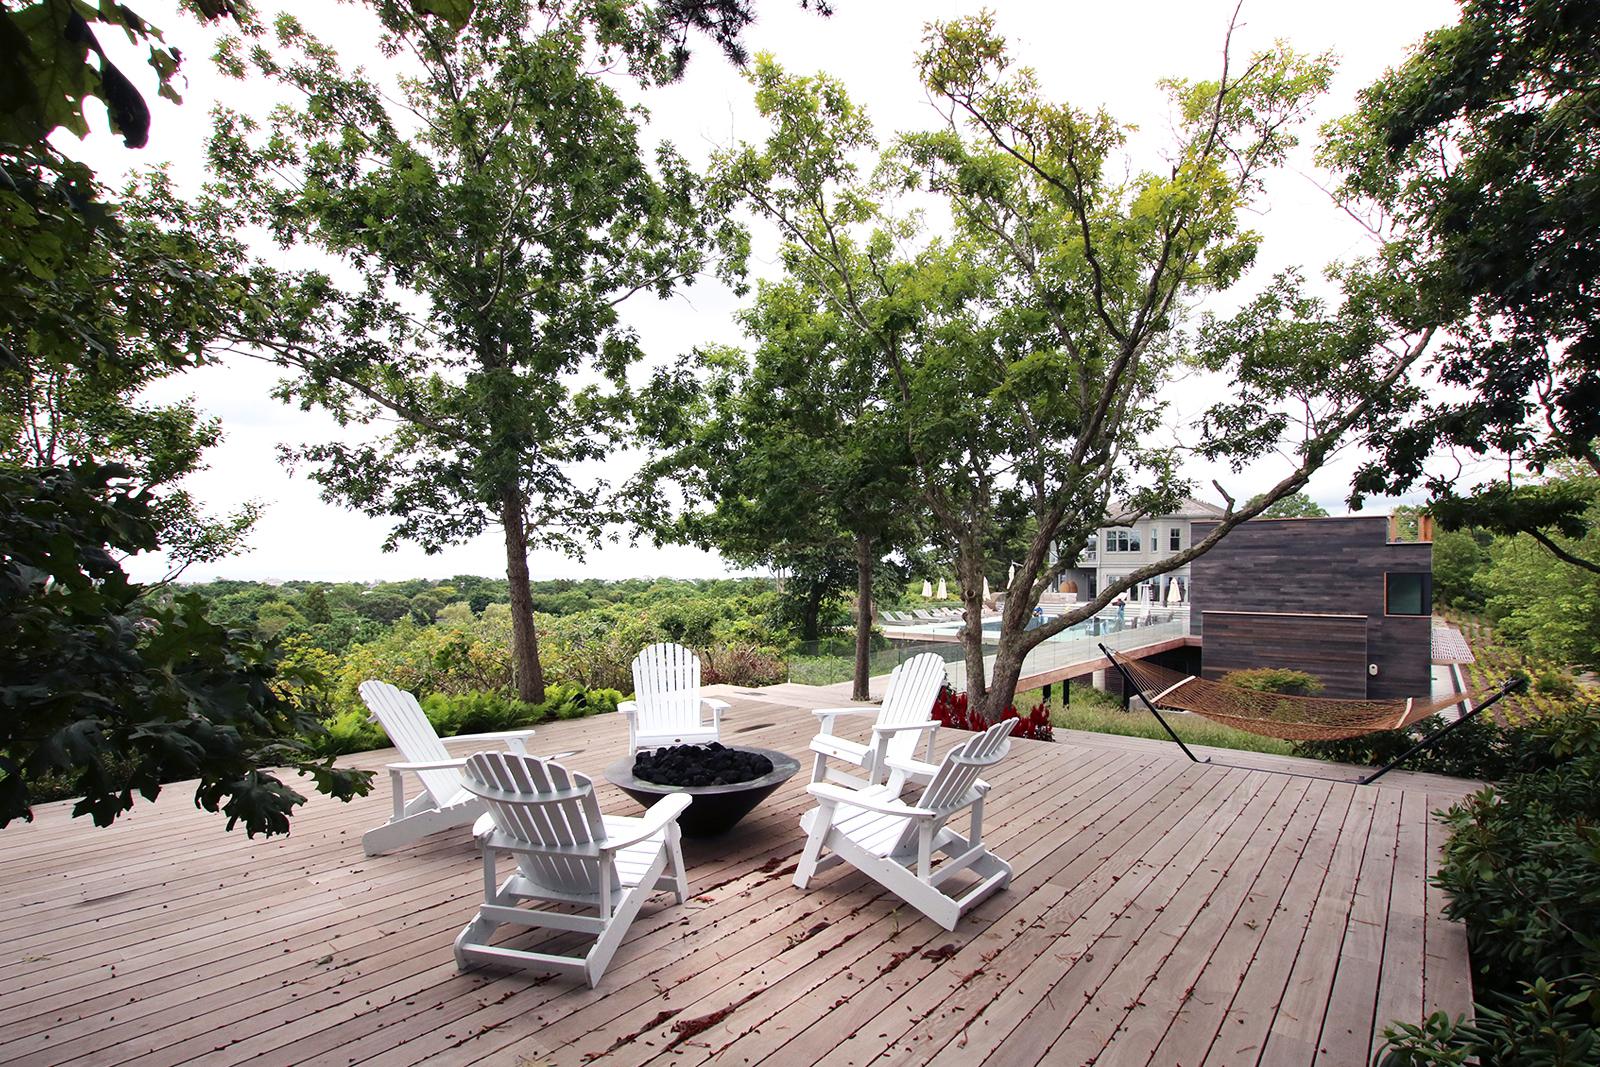 res4-resolution-4-architecture-modern-modular-house-prefab-amagansett-addition-exterior-deck-terrace-lounge.jpg